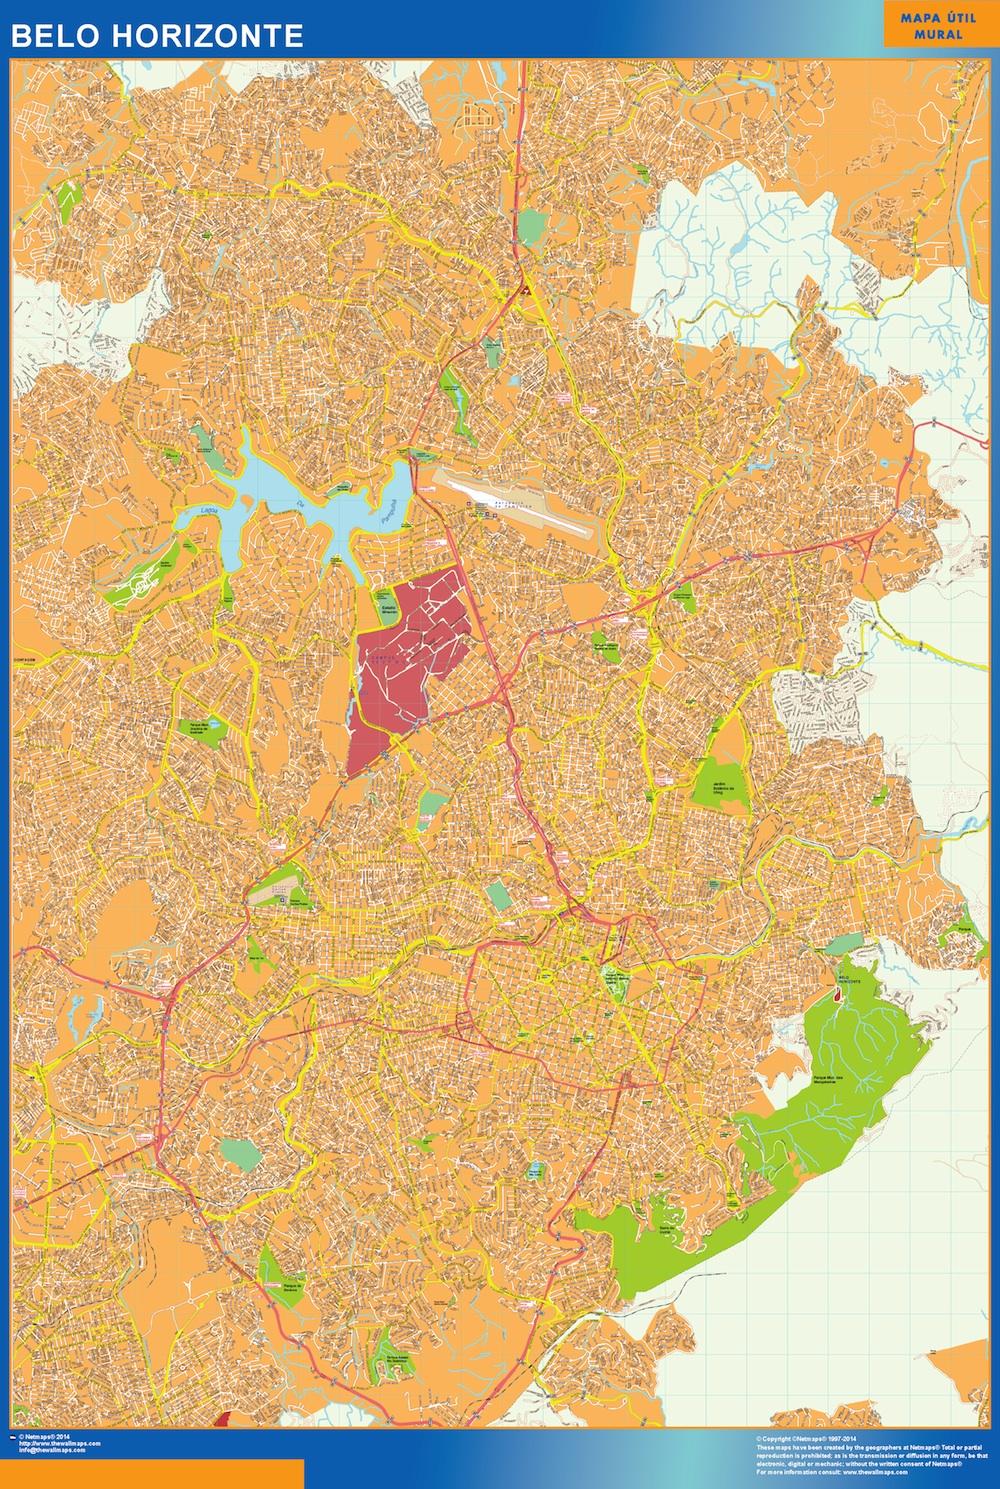 Mapa Belo Horizonte Brasil plastificado gigante